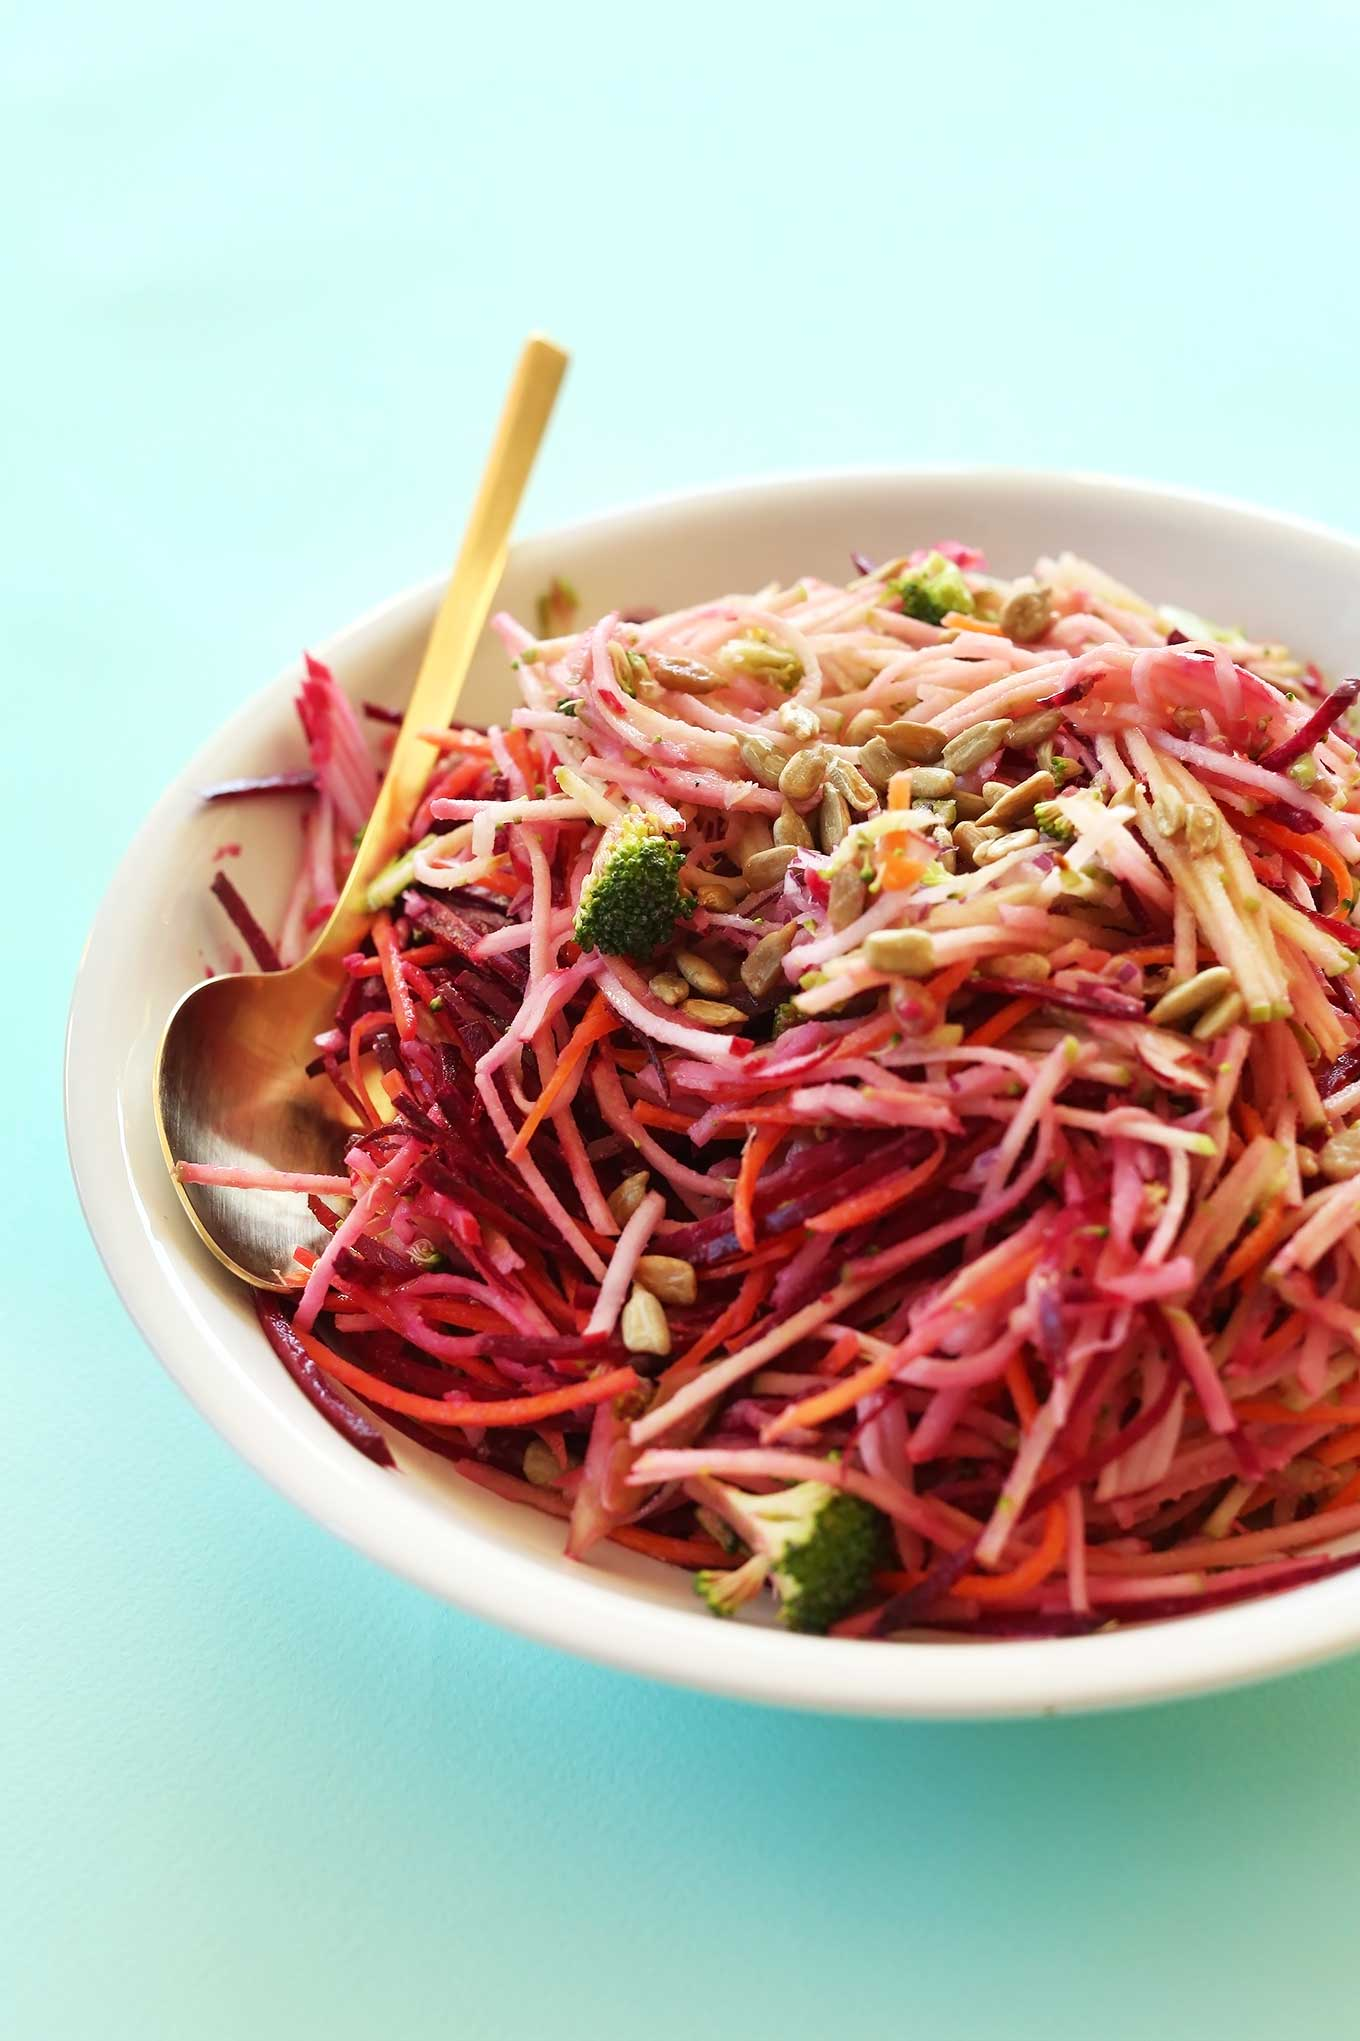 Big bowl of our gluten-free vegan Fall Slaw